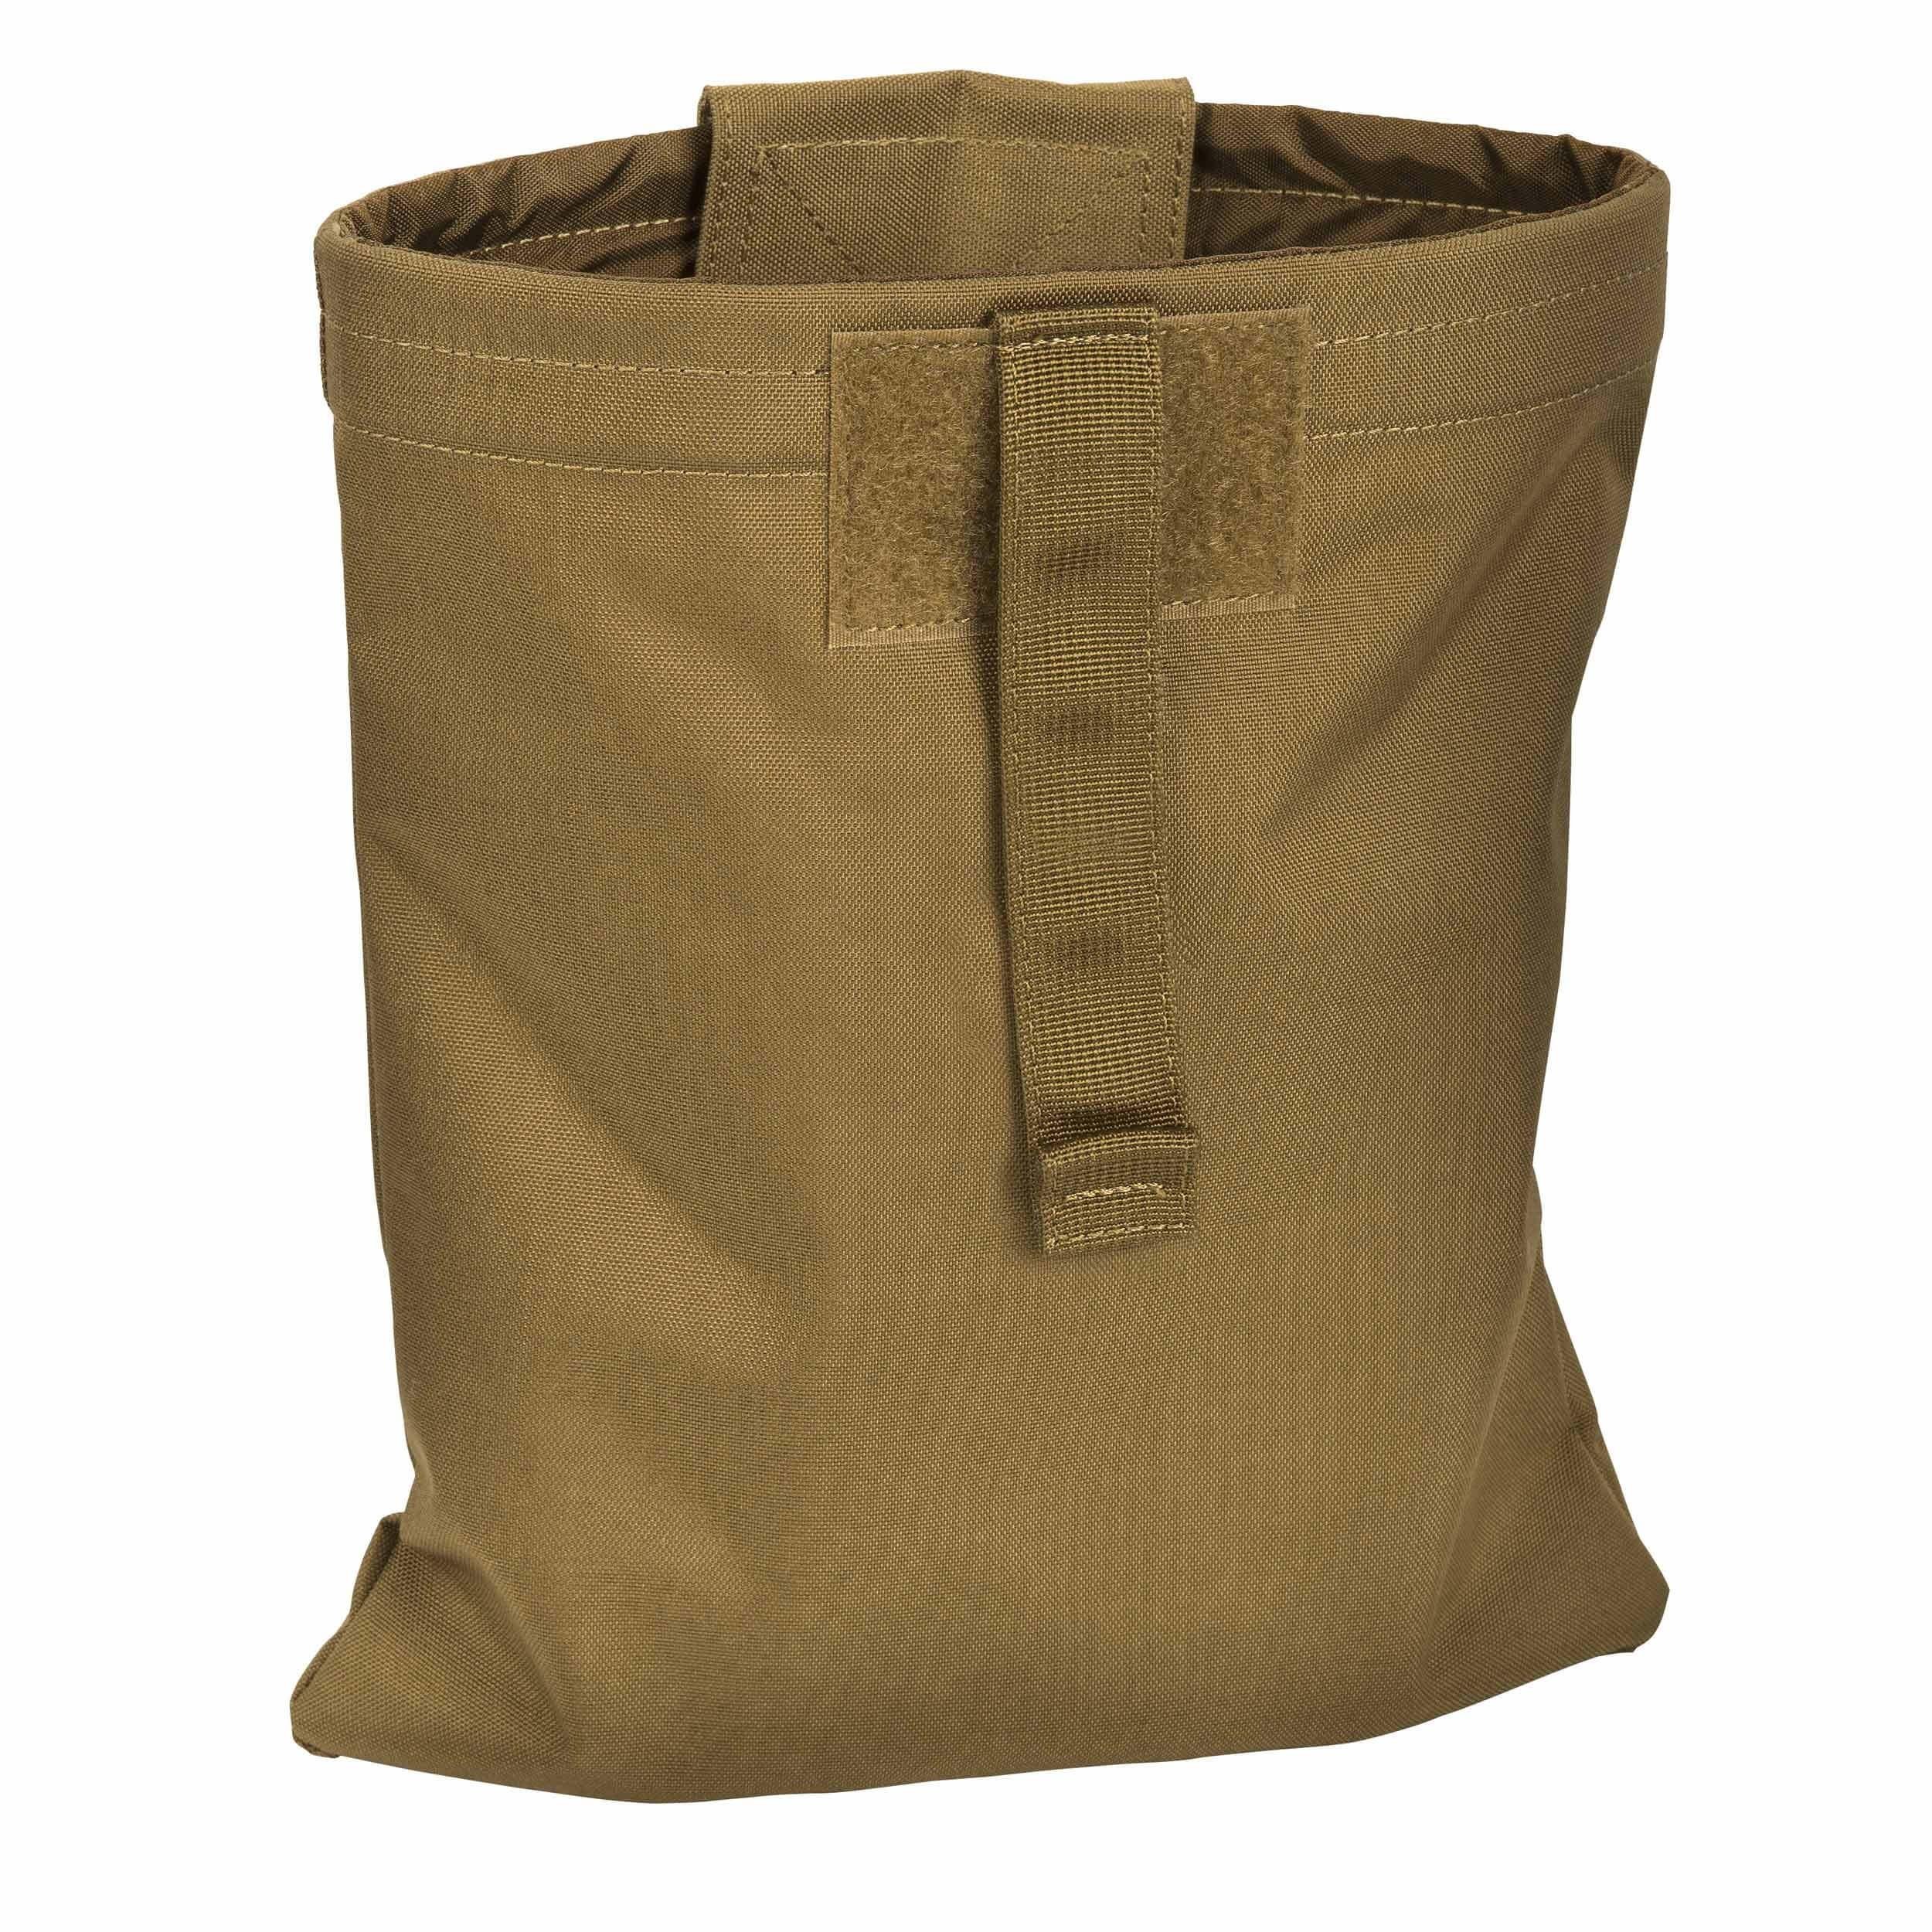 Helikon-Tex Brass Roll Dump Bag Coyote